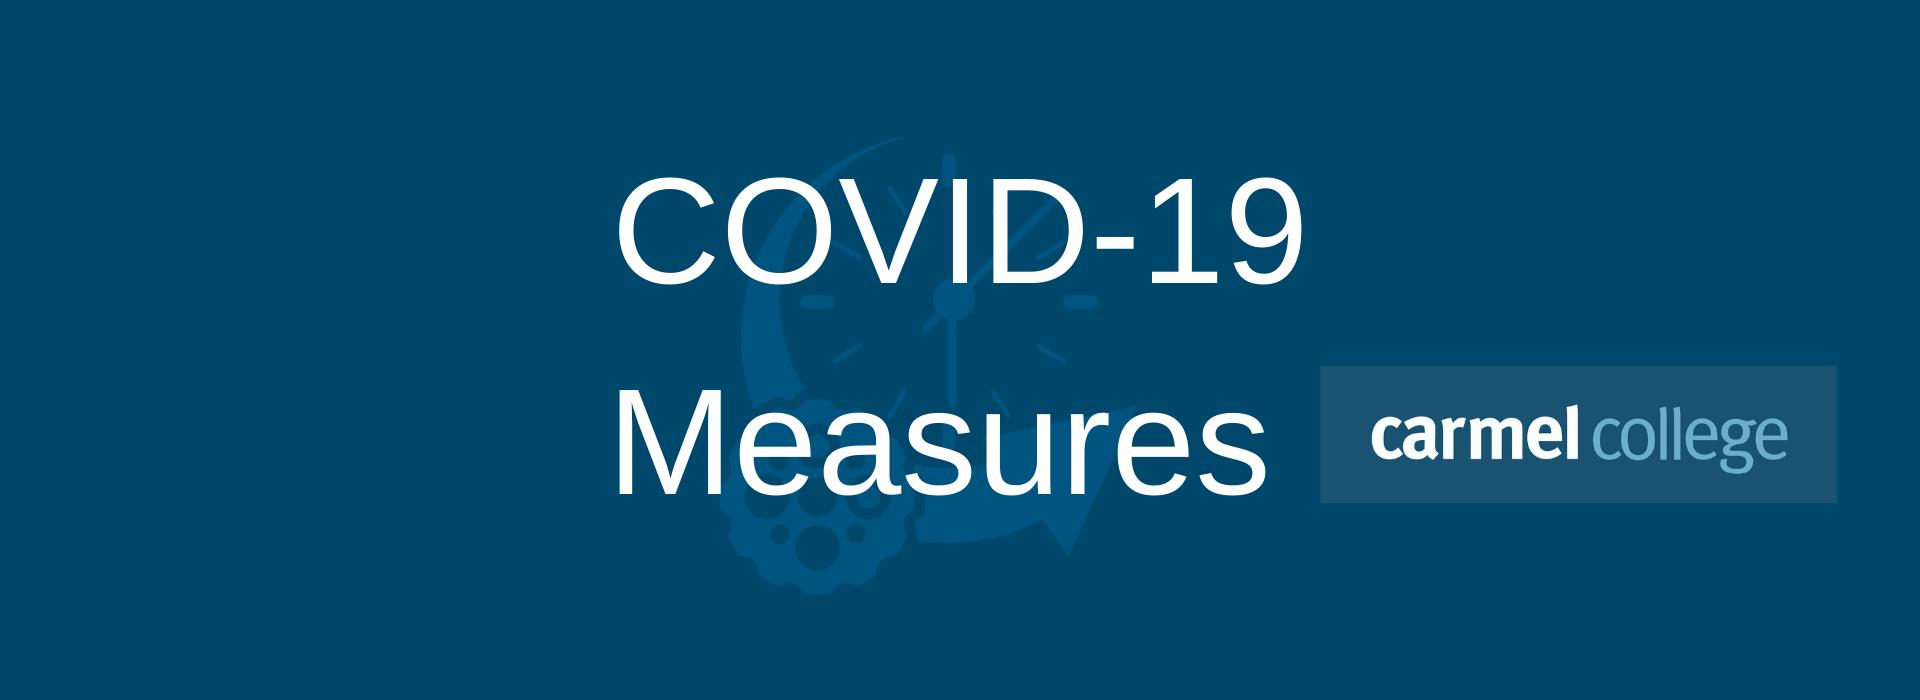 Carmel College COVID-19 Measures